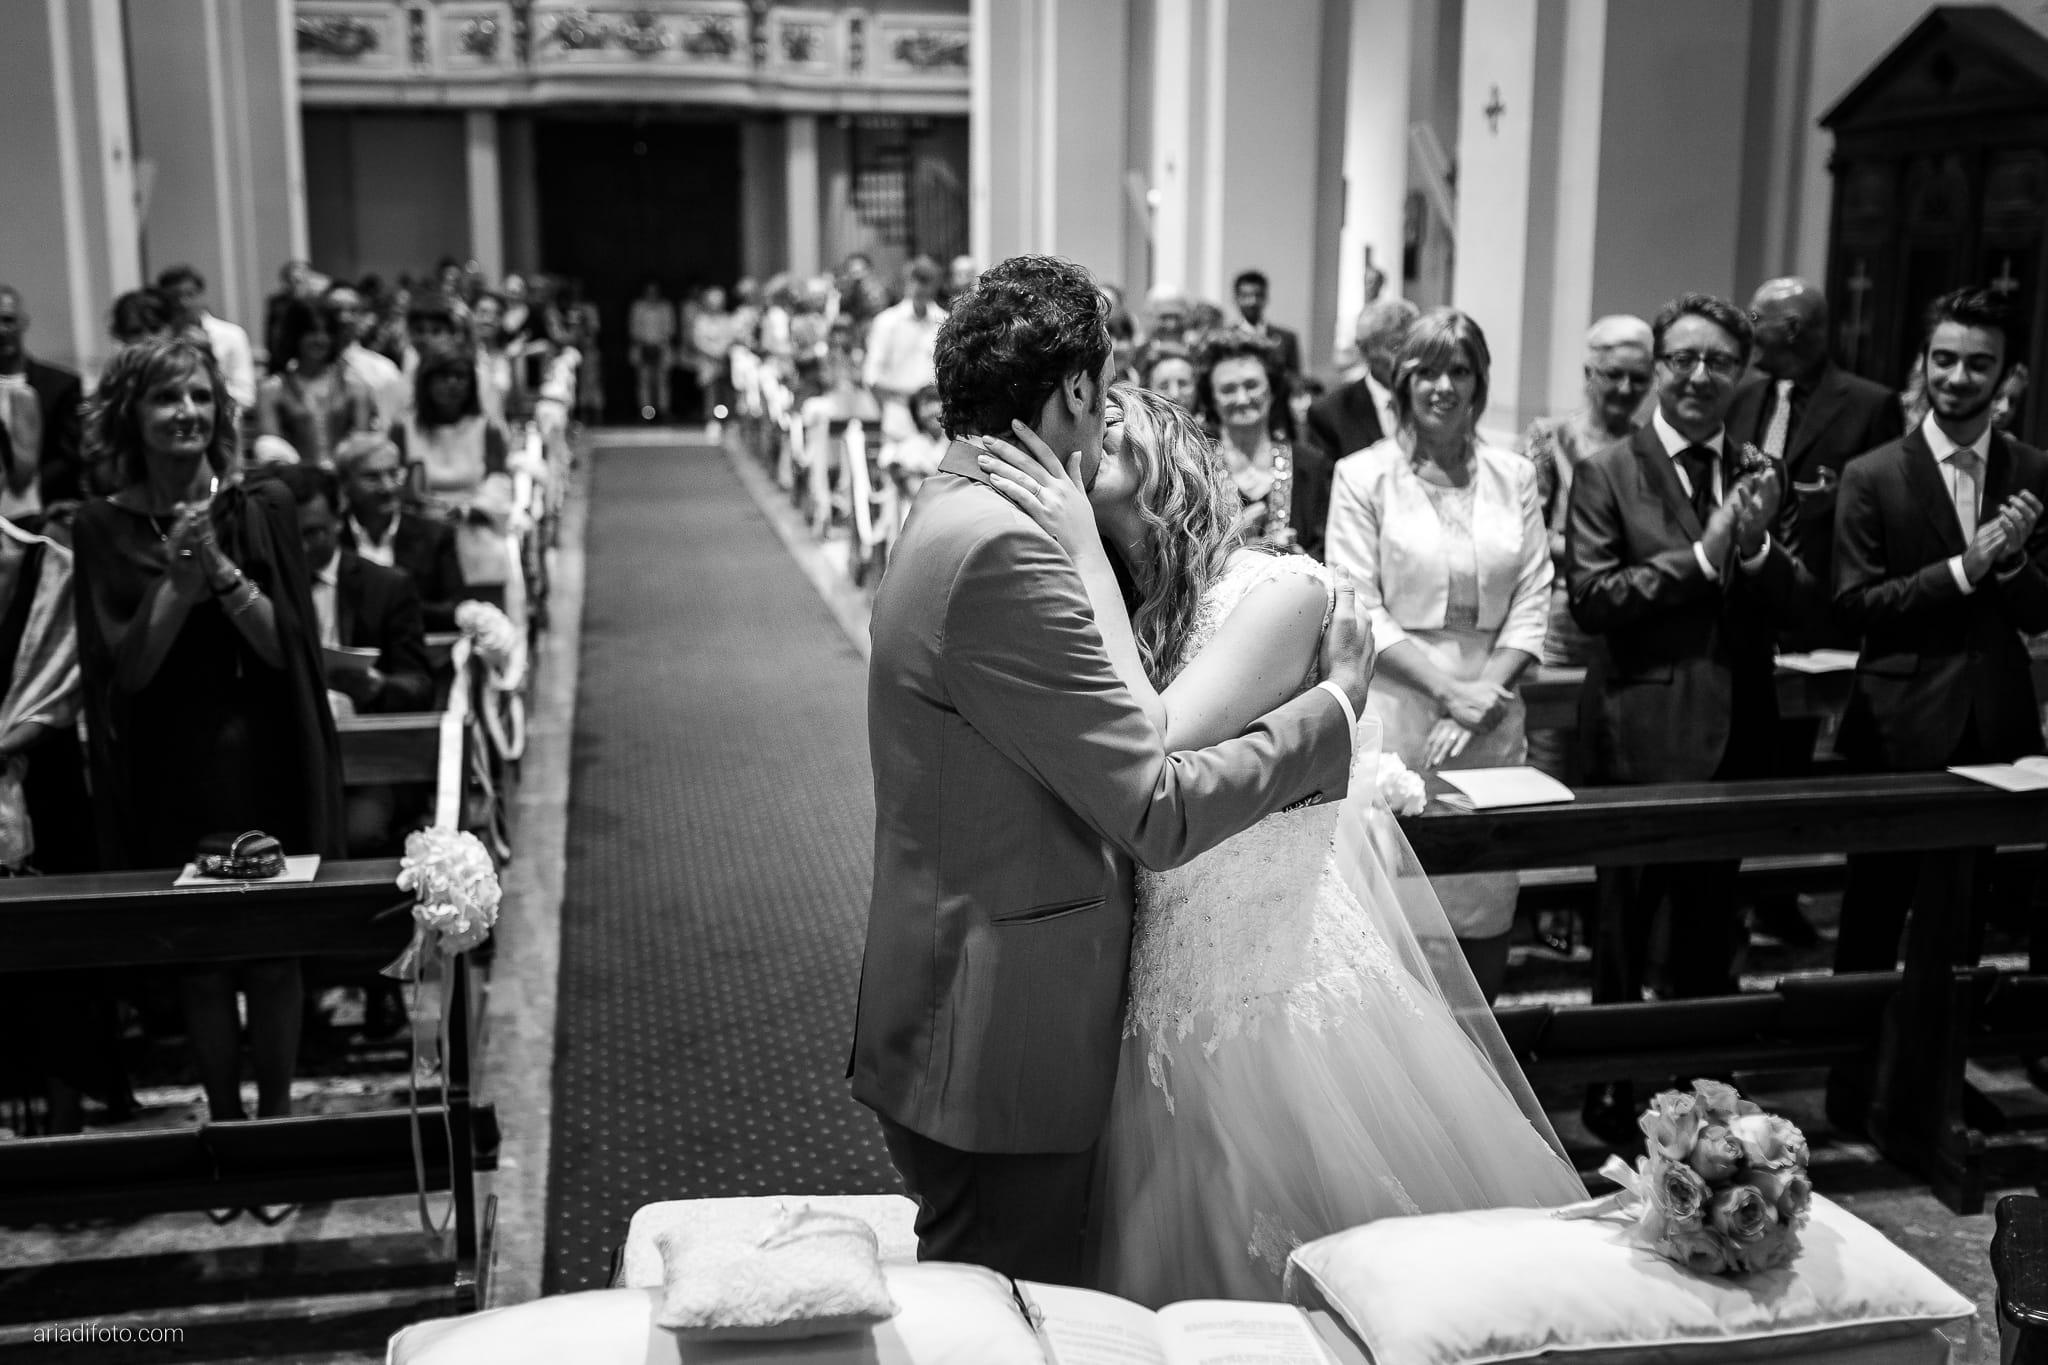 Valentina Francesco Matrimonio Chiesa San Giorgio Martire Pagnacco Castello Villalta Fagagna Udine cerimonia bacio